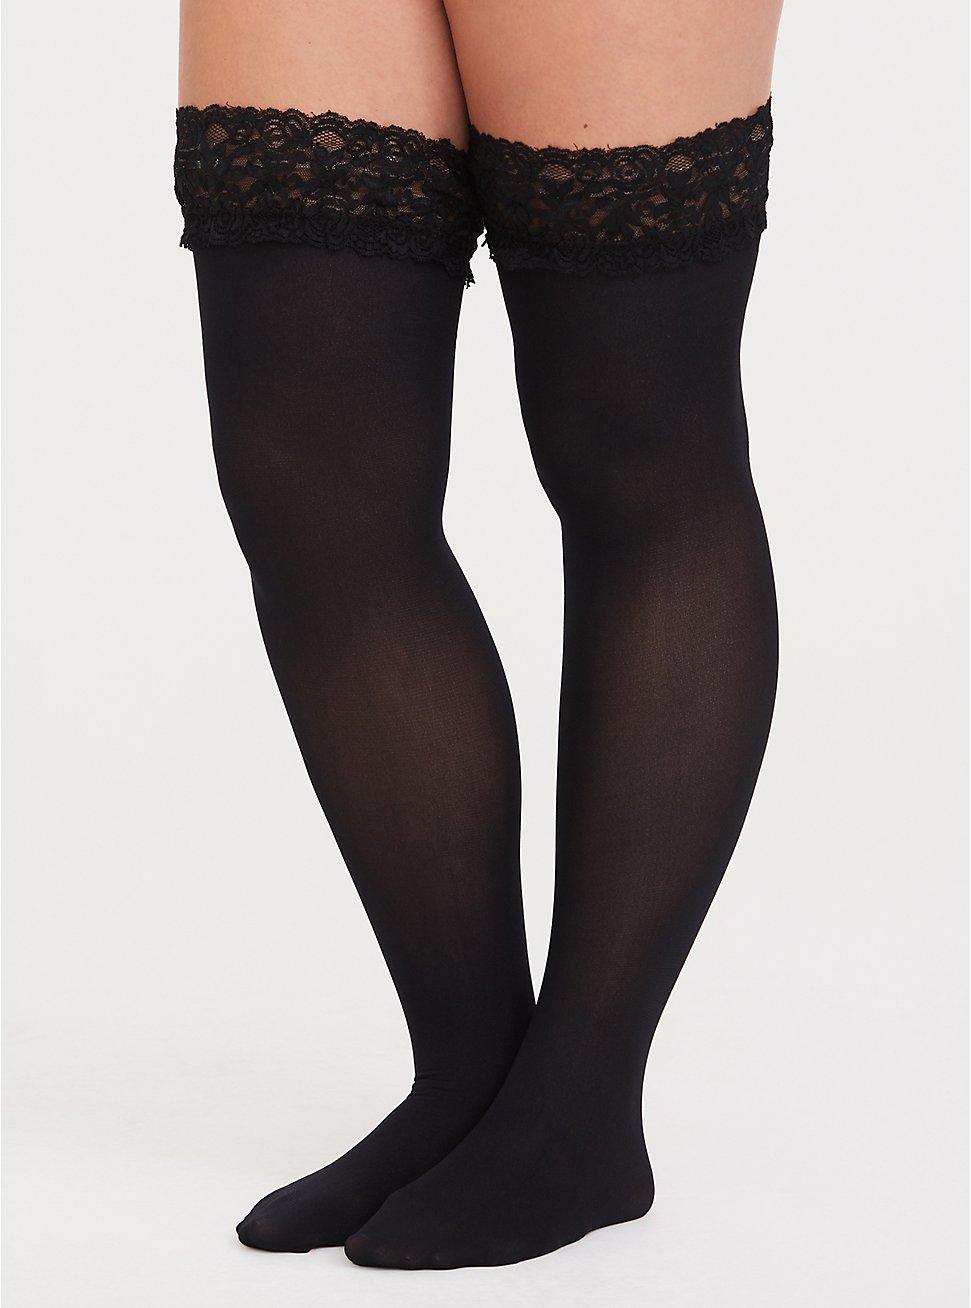 Black Lace Thigh High Tights, BLACK, hi-res